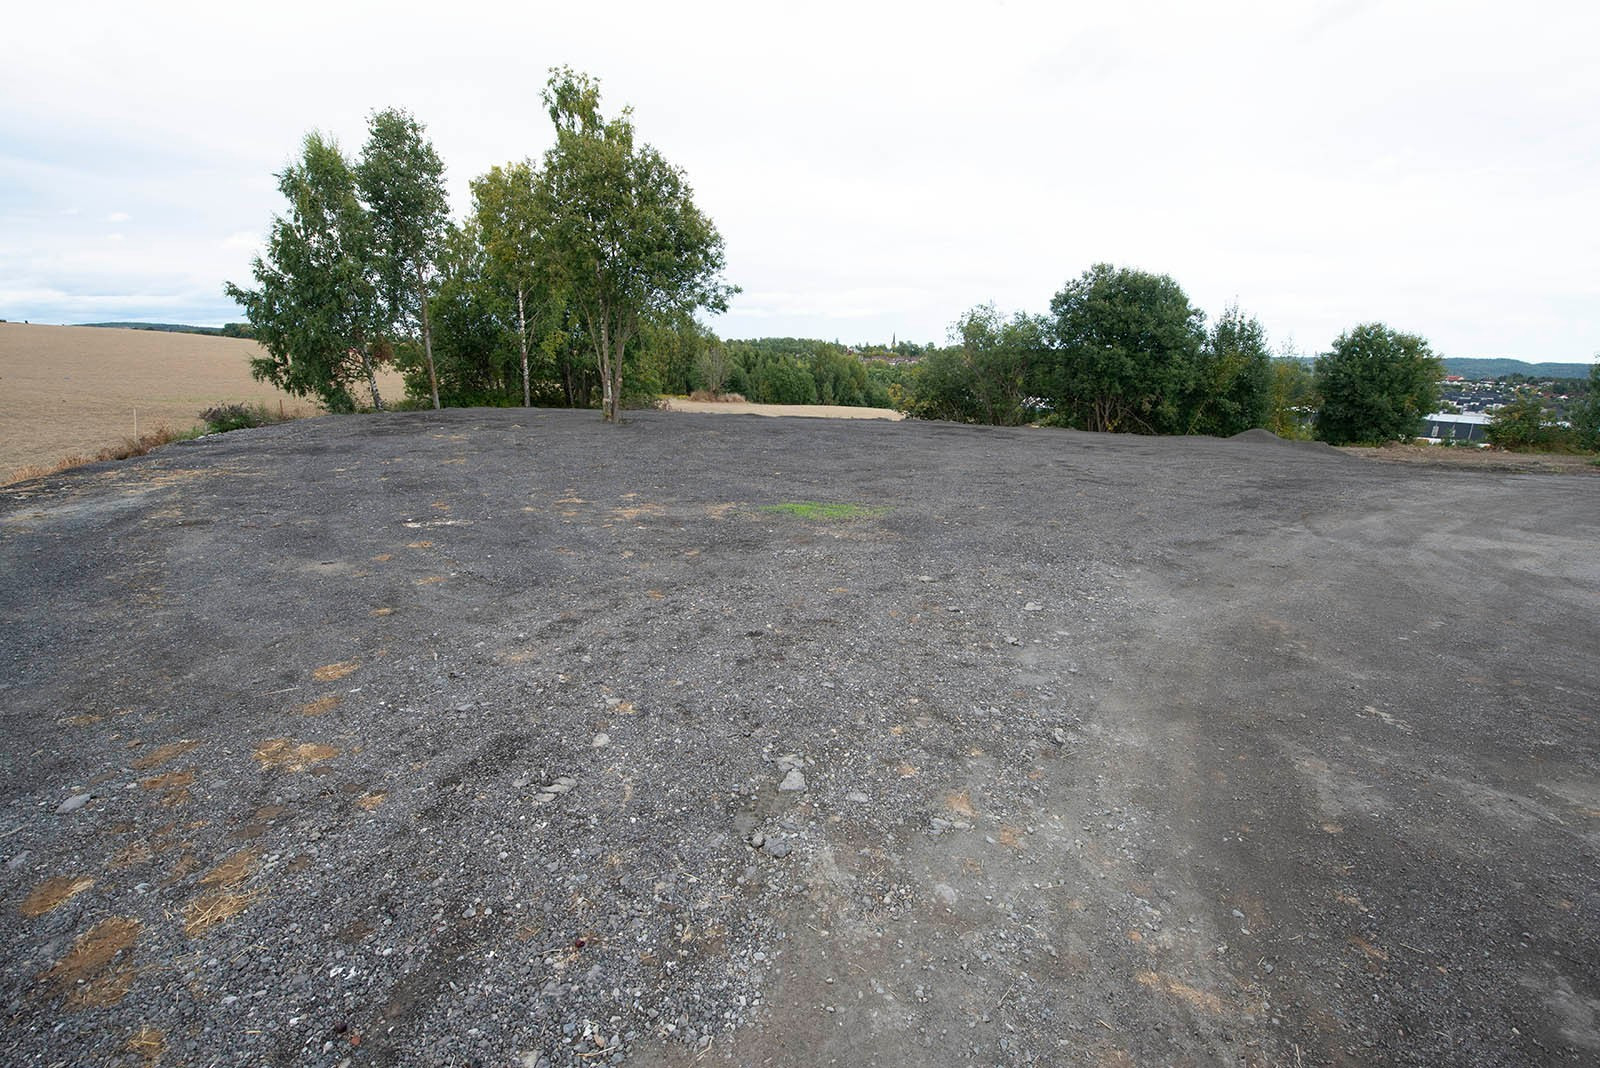 Opparbeidet uteplass - asfalt fresemasser